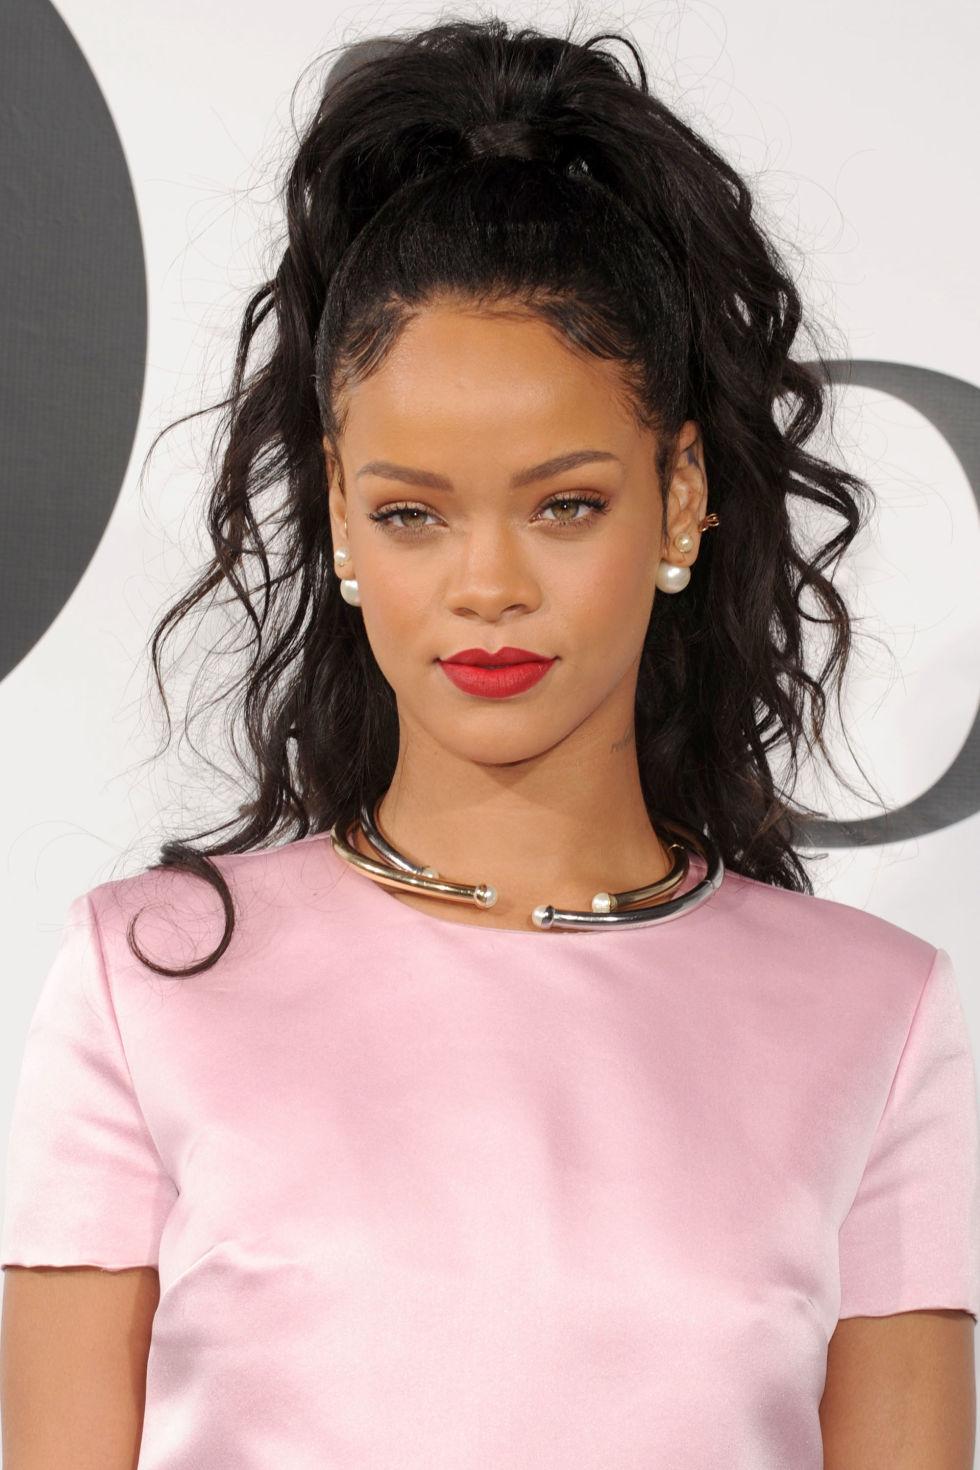 Pleasing Half Up Half Down Hairstyles How To Do Half Up Half Down Hair Short Hairstyles For Black Women Fulllsitofus